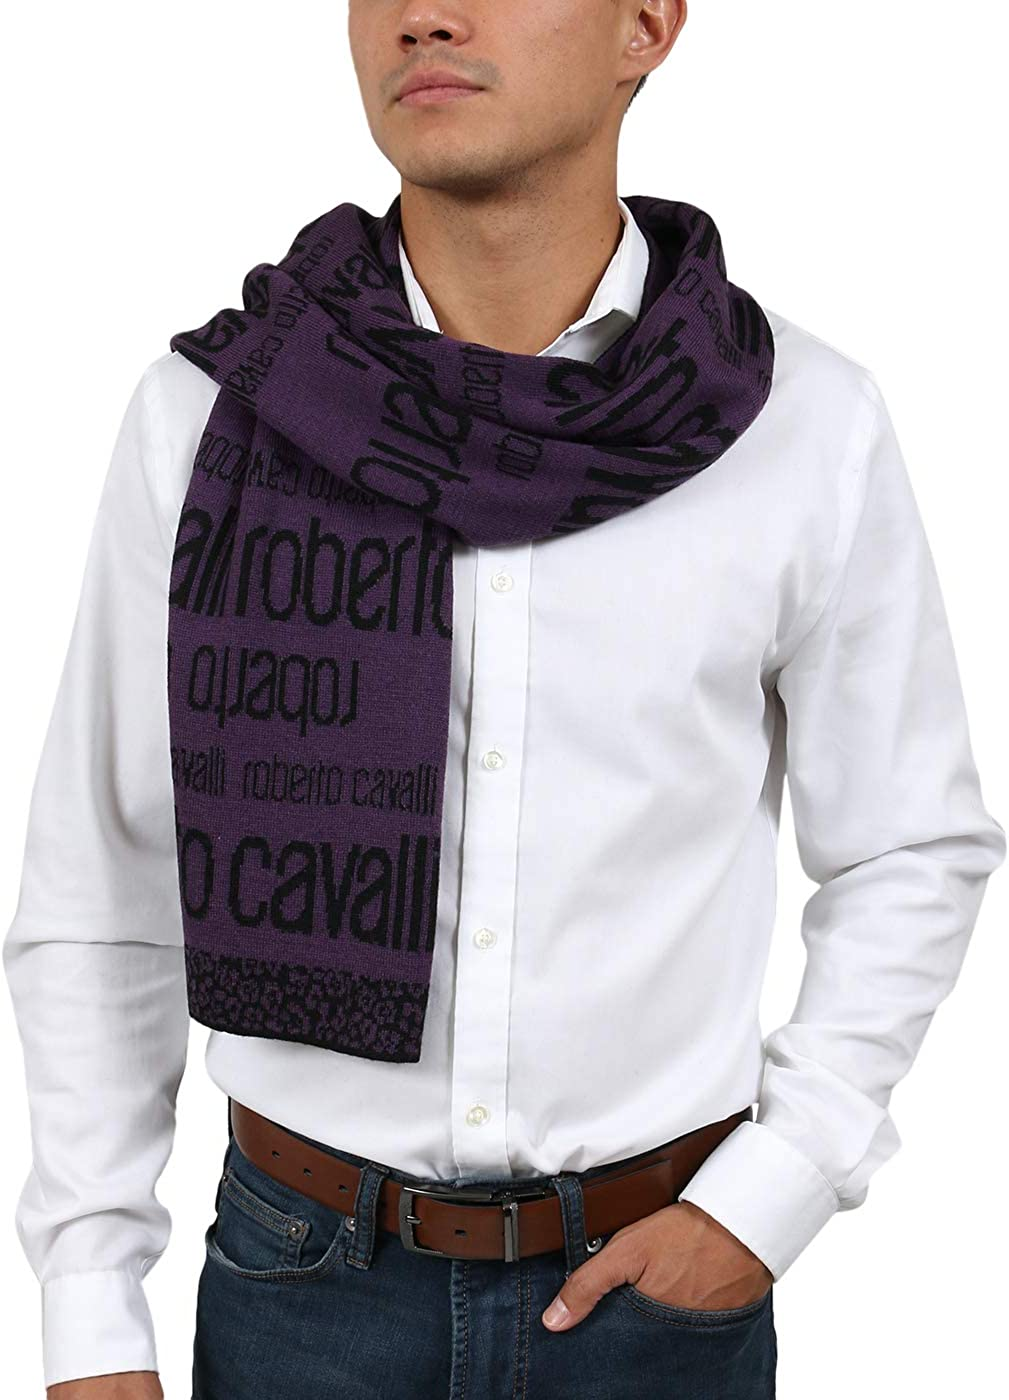 Roberto Cavalli ESZ068 03000 Purple Mens Sc New product!! Signature Blend Wool New Shipping Free